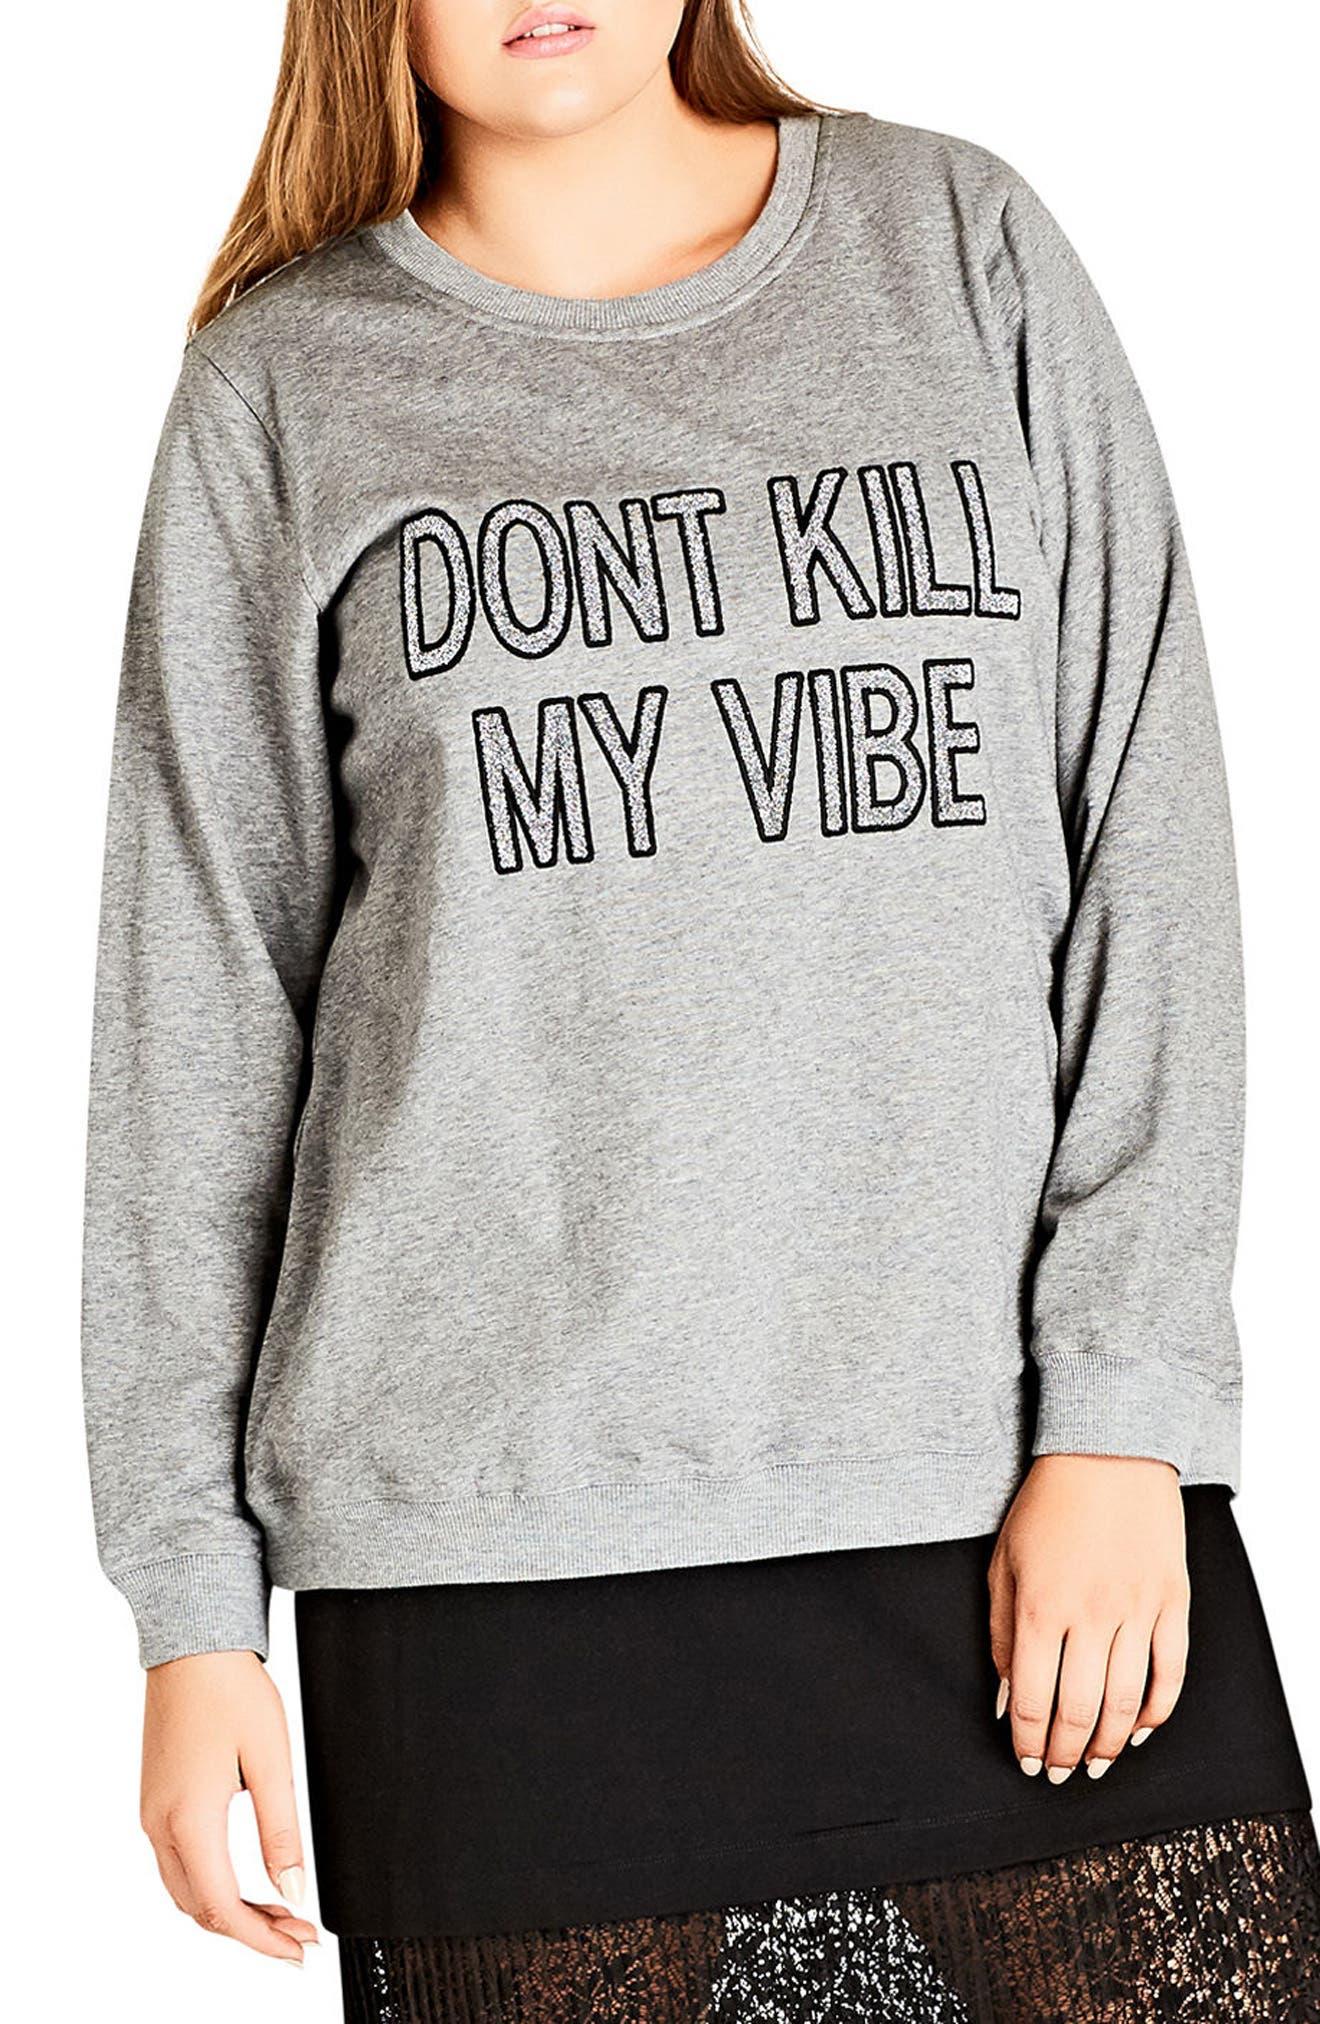 Alternate Image 1 Selected - City Chic Vibes Glitter Graphic Sweatshirt (Plus Size)